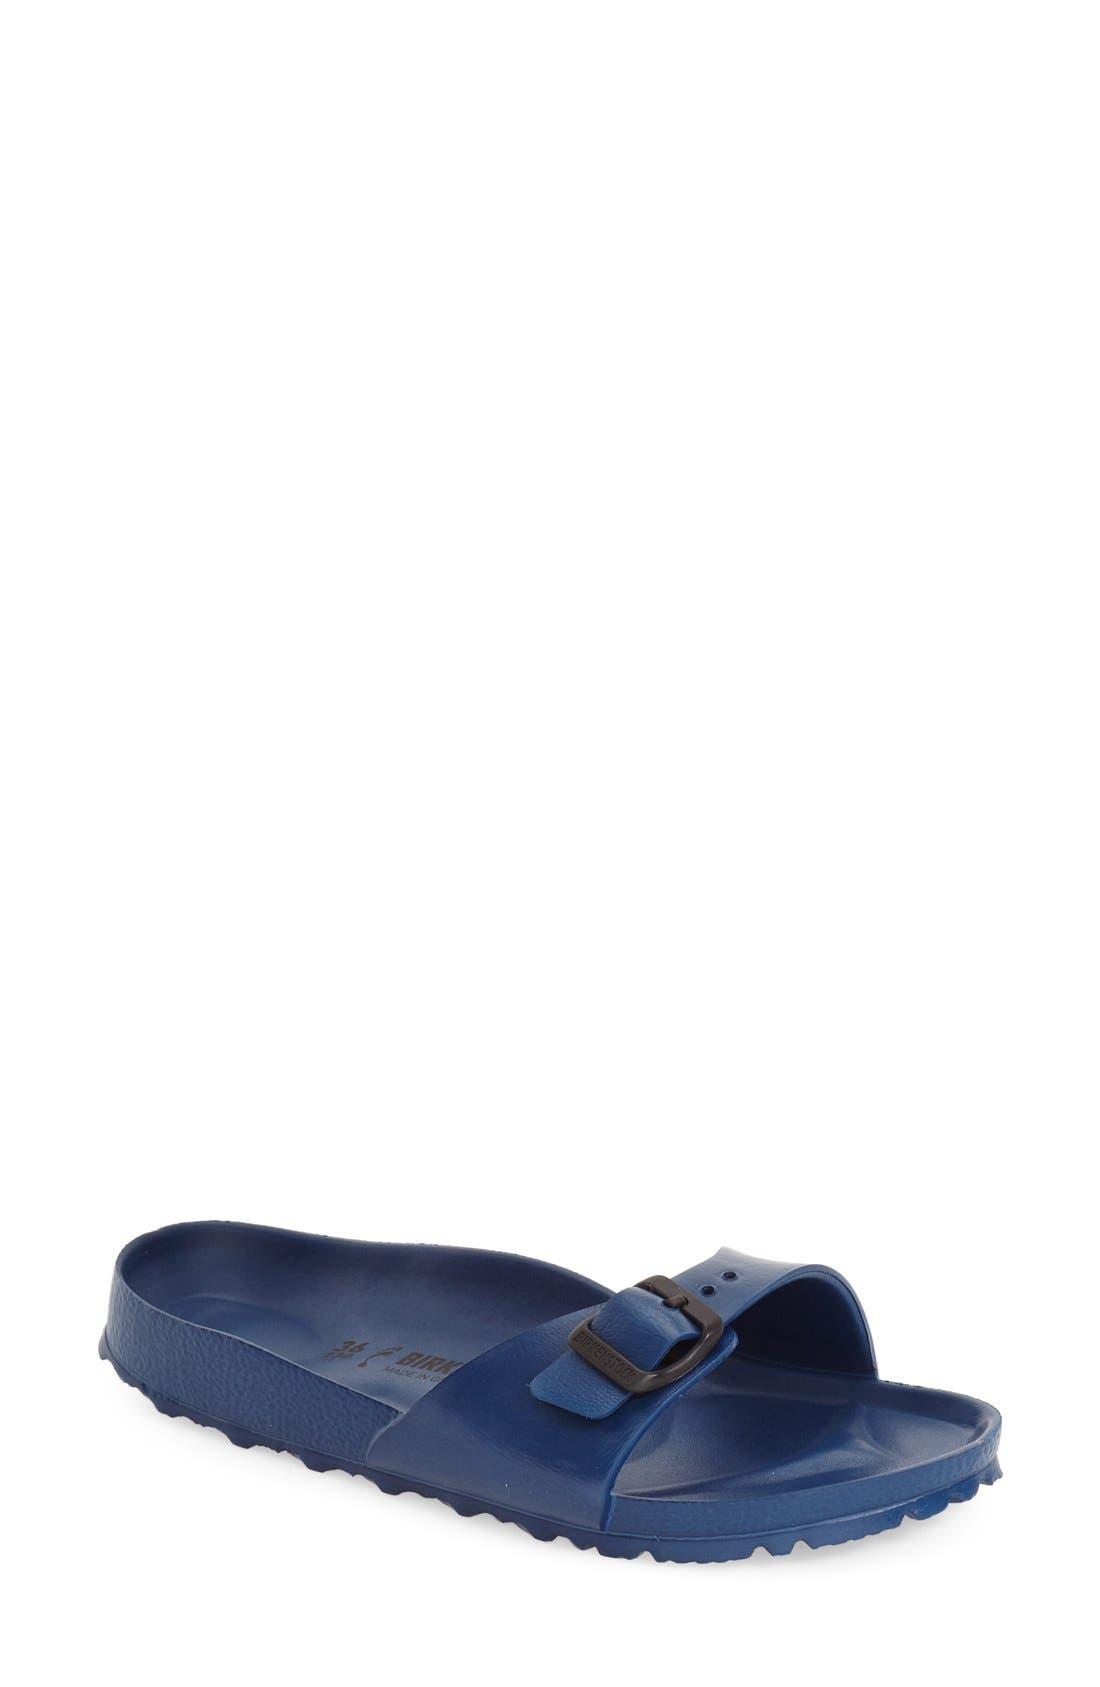 'Essentials - Madrid' Slide Sandal,                         Main,                         color, Navy Eva